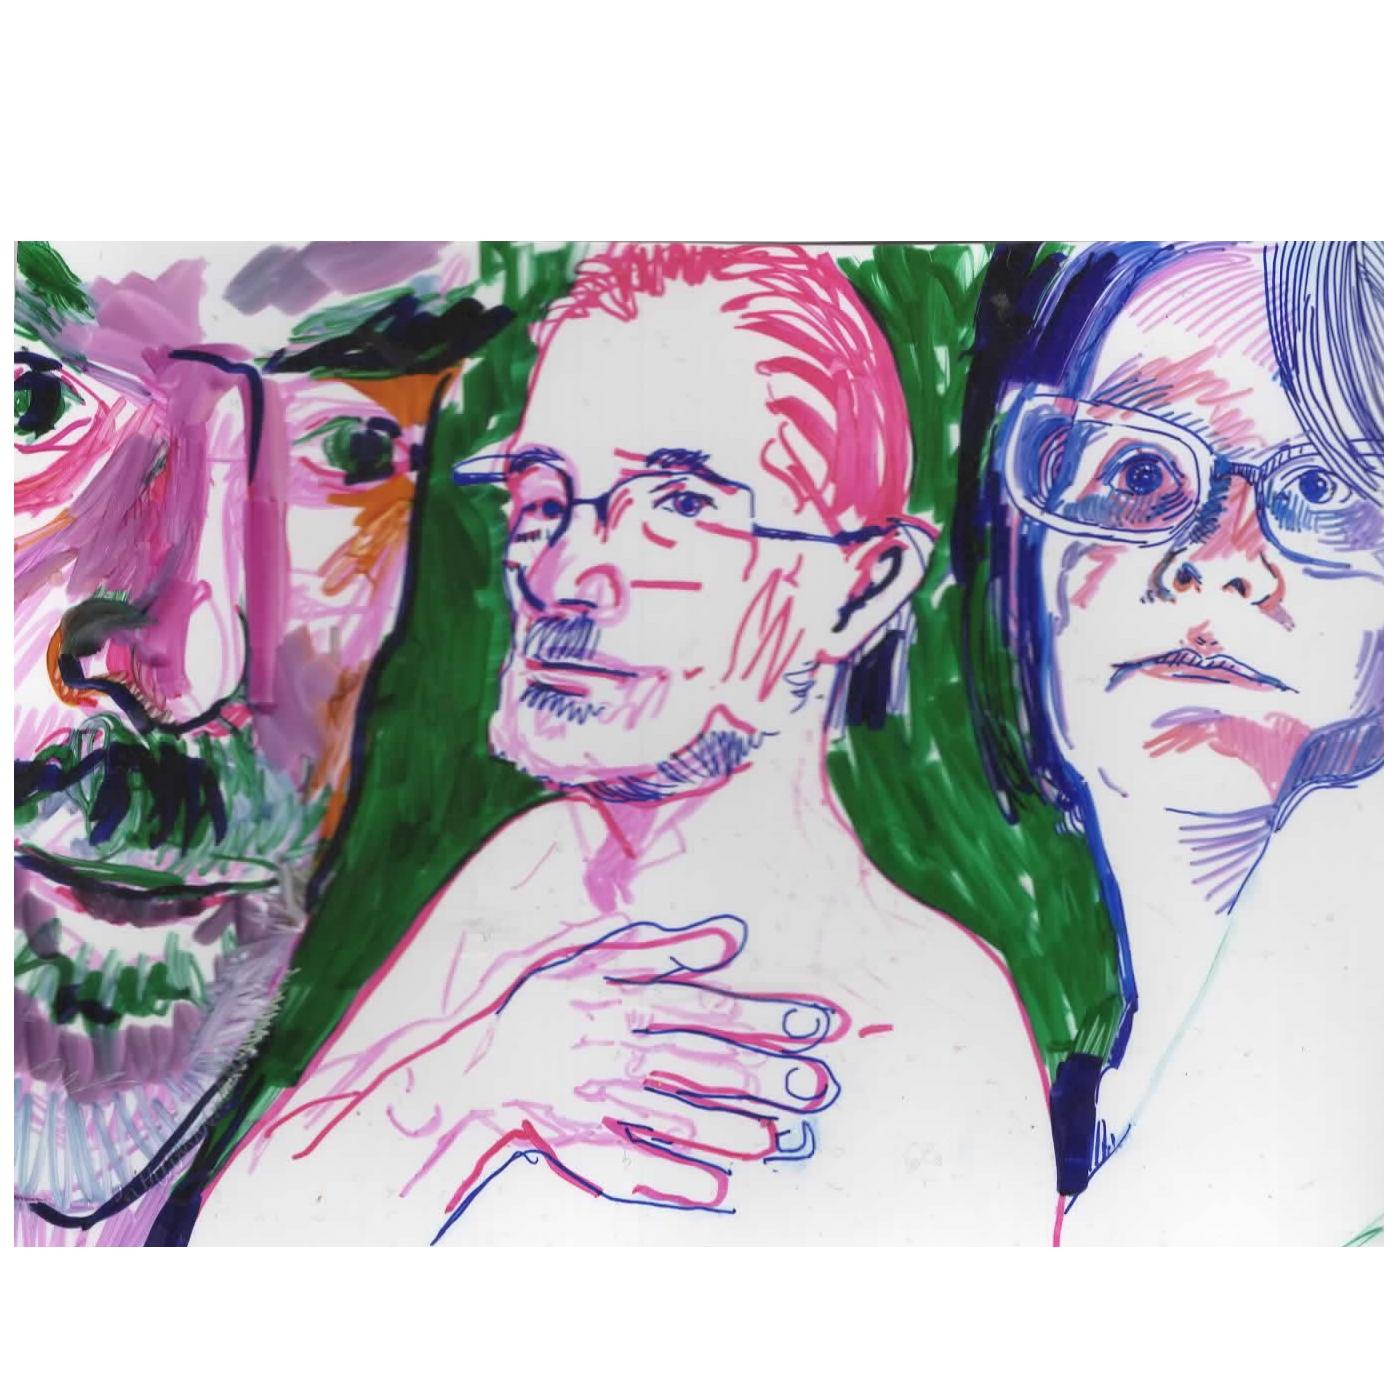 Jake Brian and Gila Shrink Film Trio Portraits